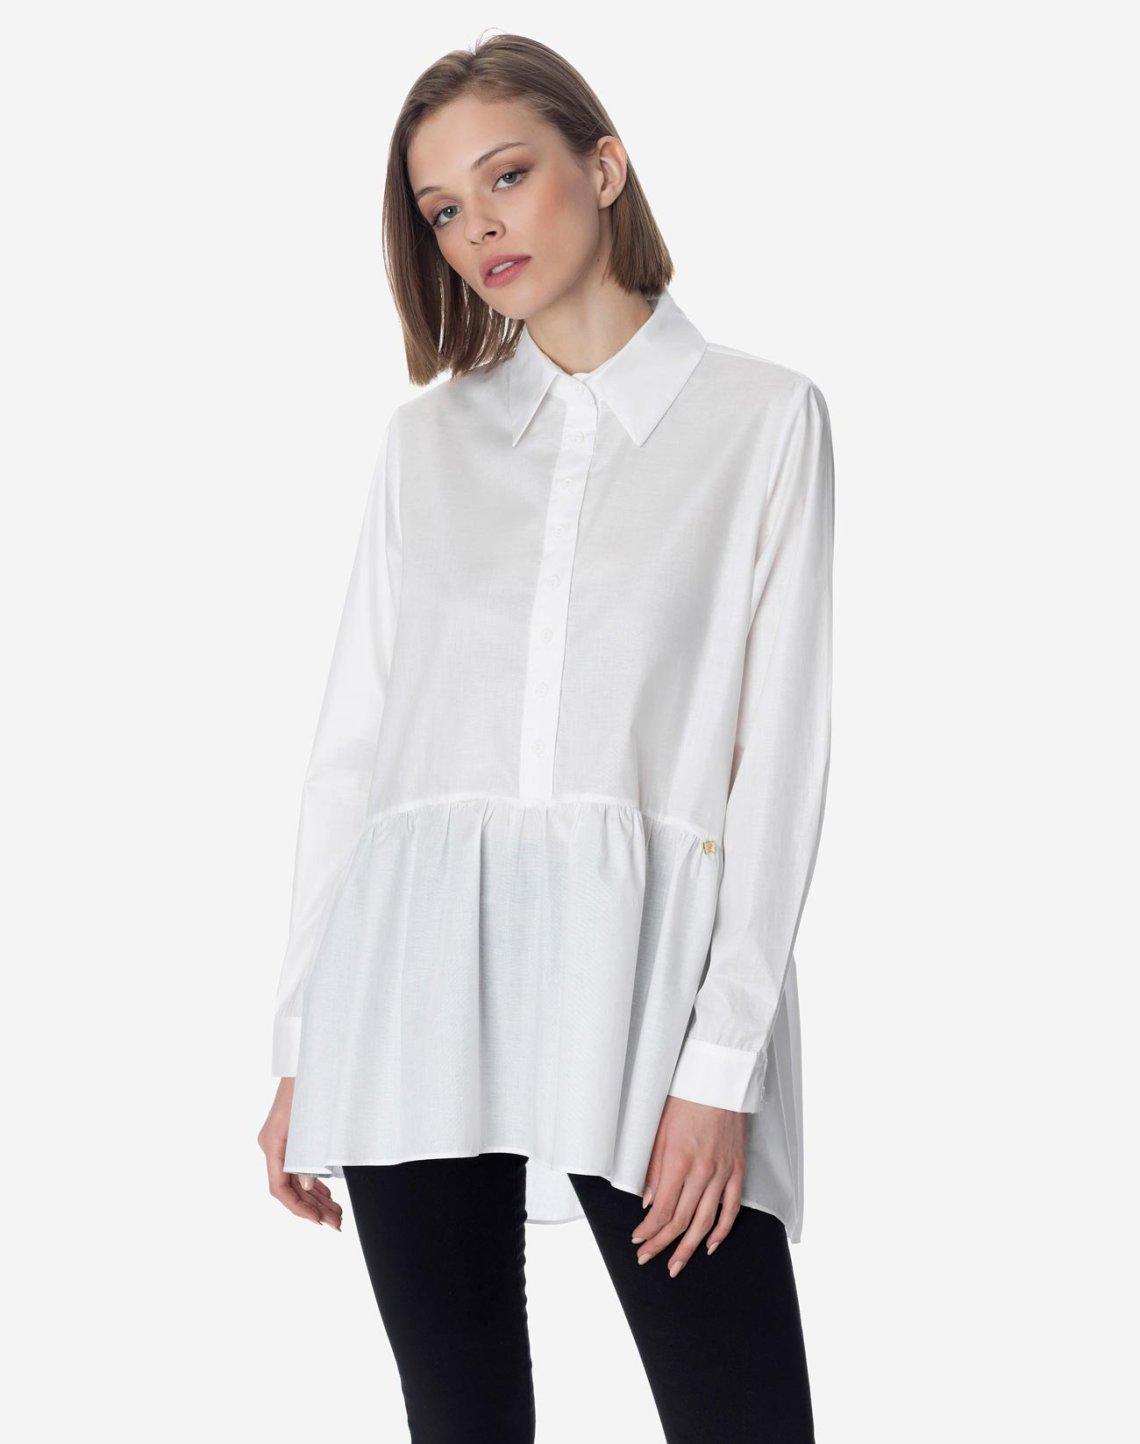 Shirt with ruffle hem